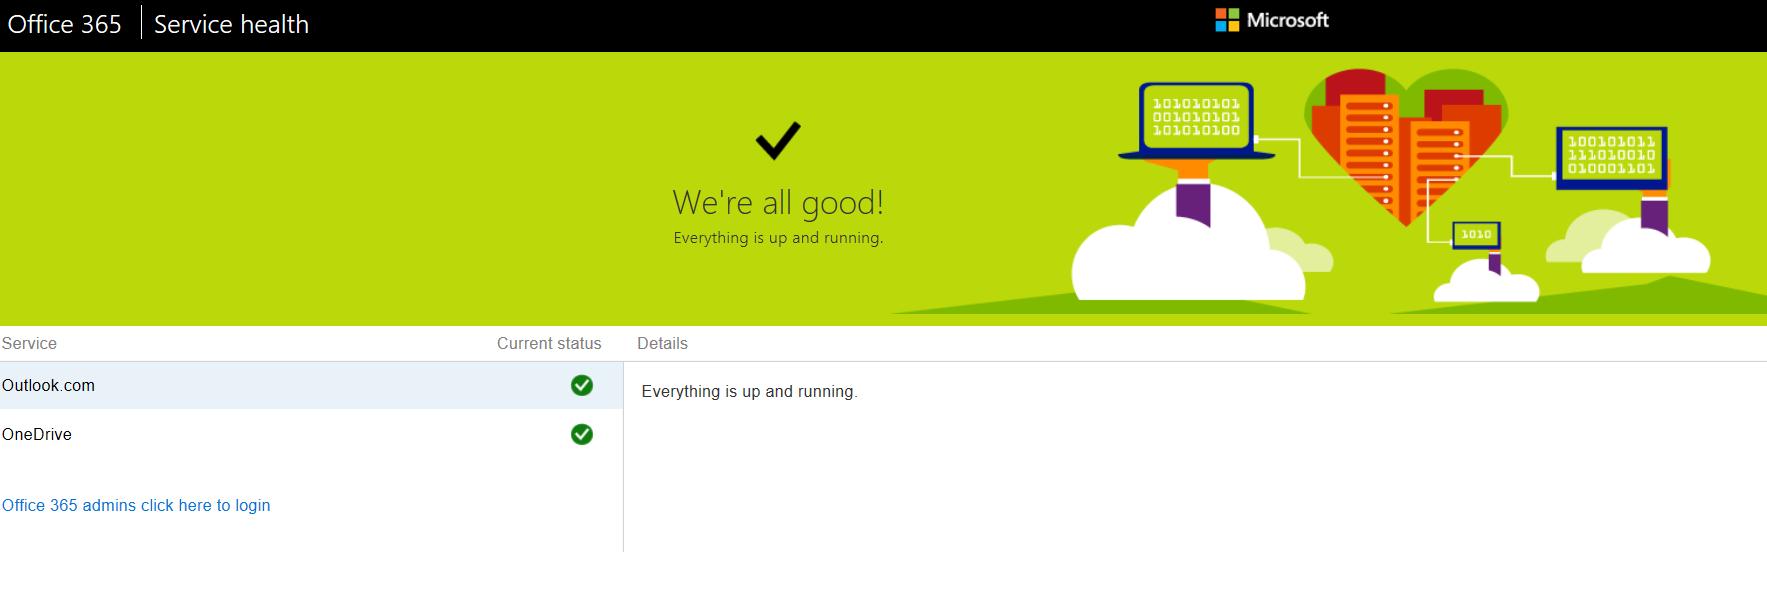 Microsoft service status